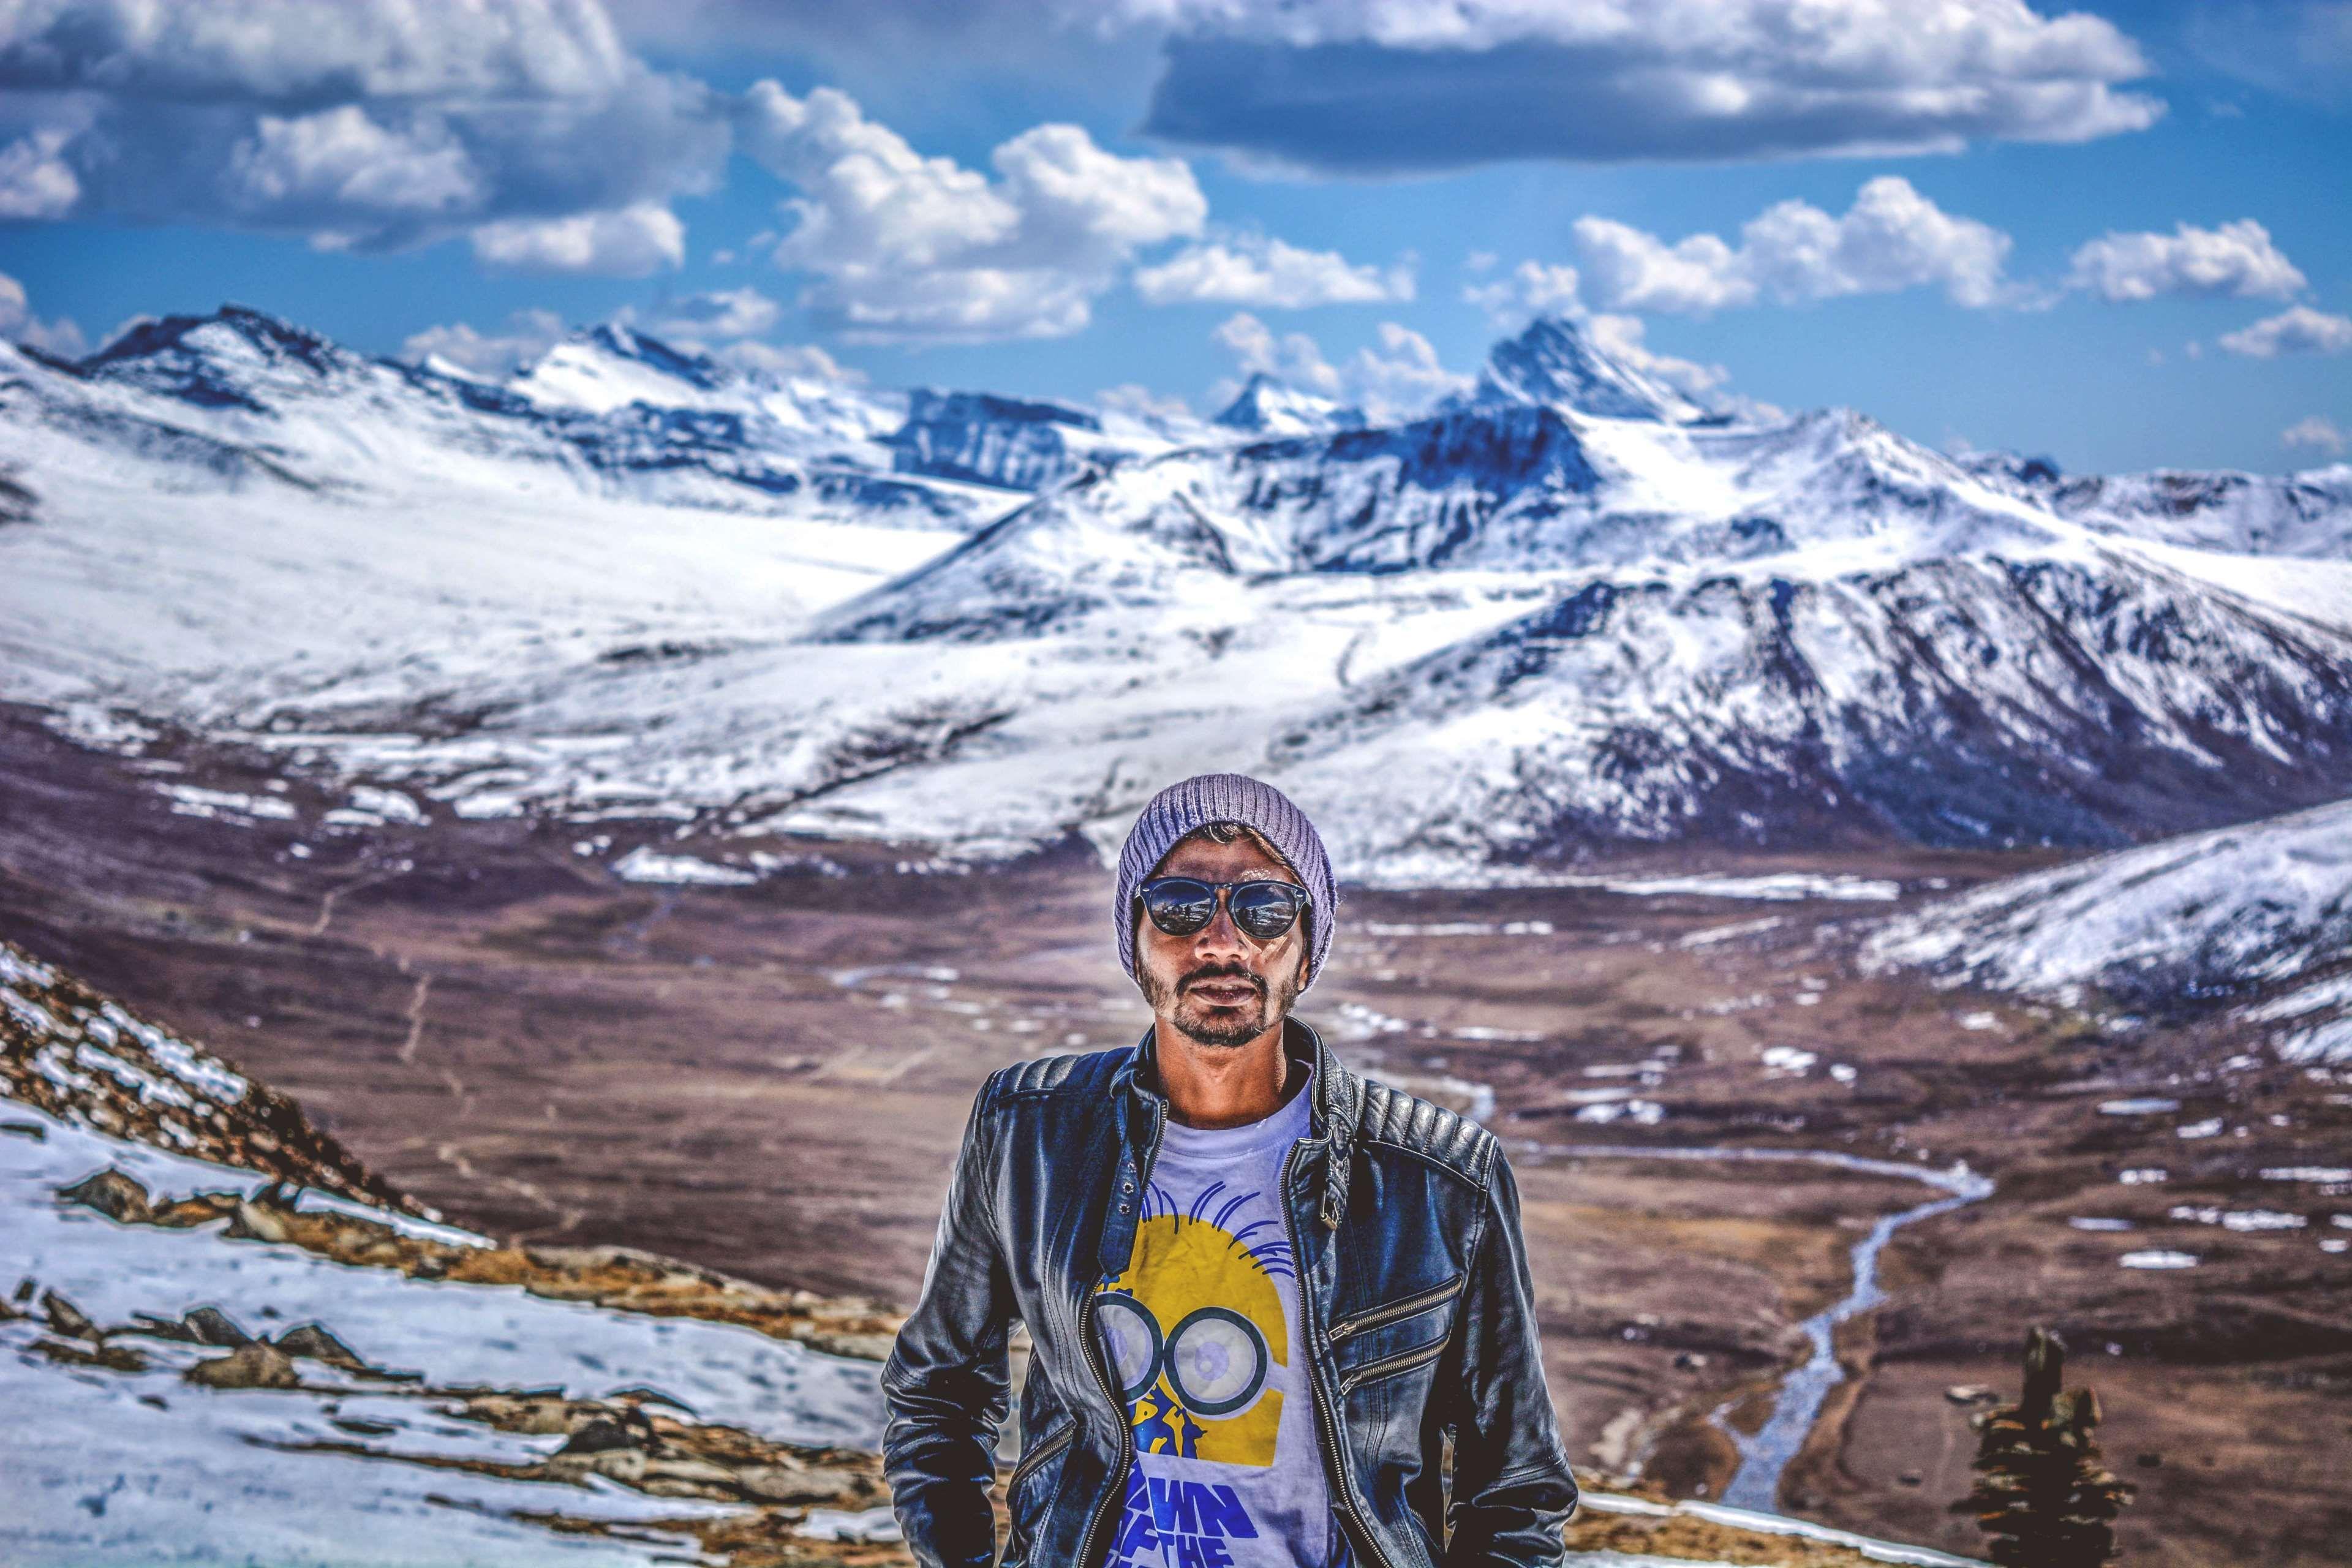 Amazing Wallpaper Mountain Portrait - 3f0c9bfa18d7be078fb88f489232424e  Perfect Image Reference_645176.jpg